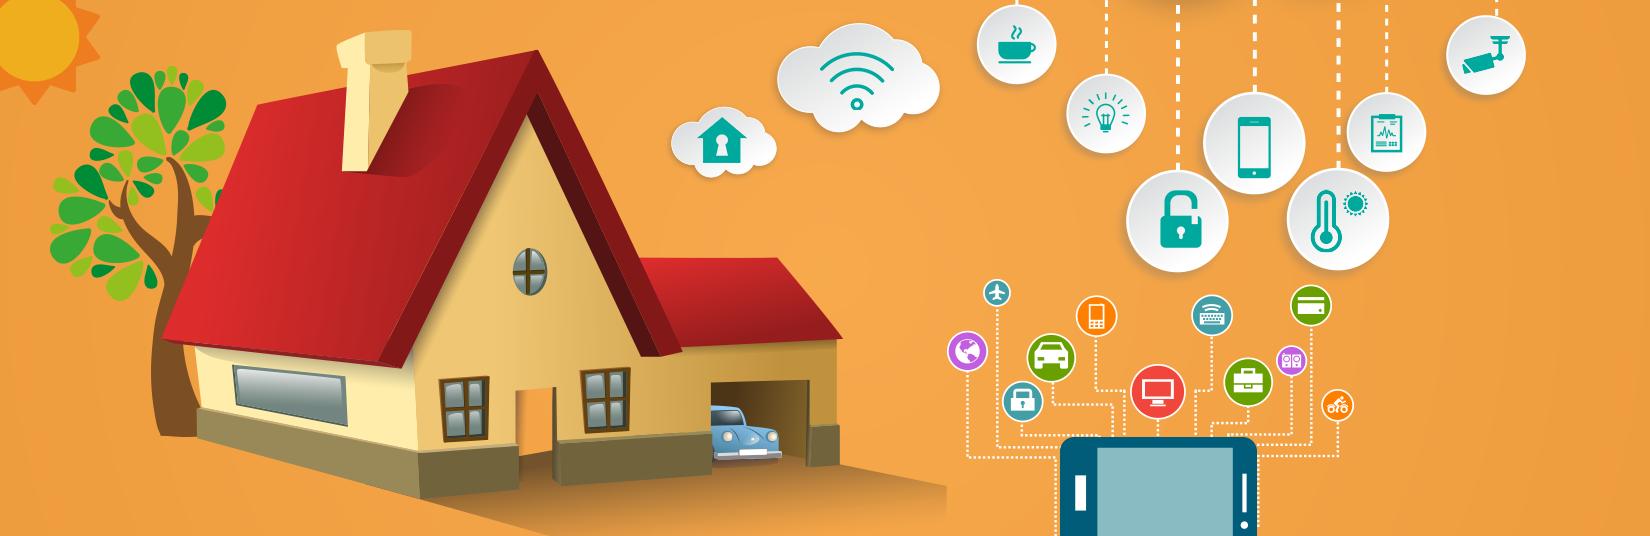 Home Automation App Development